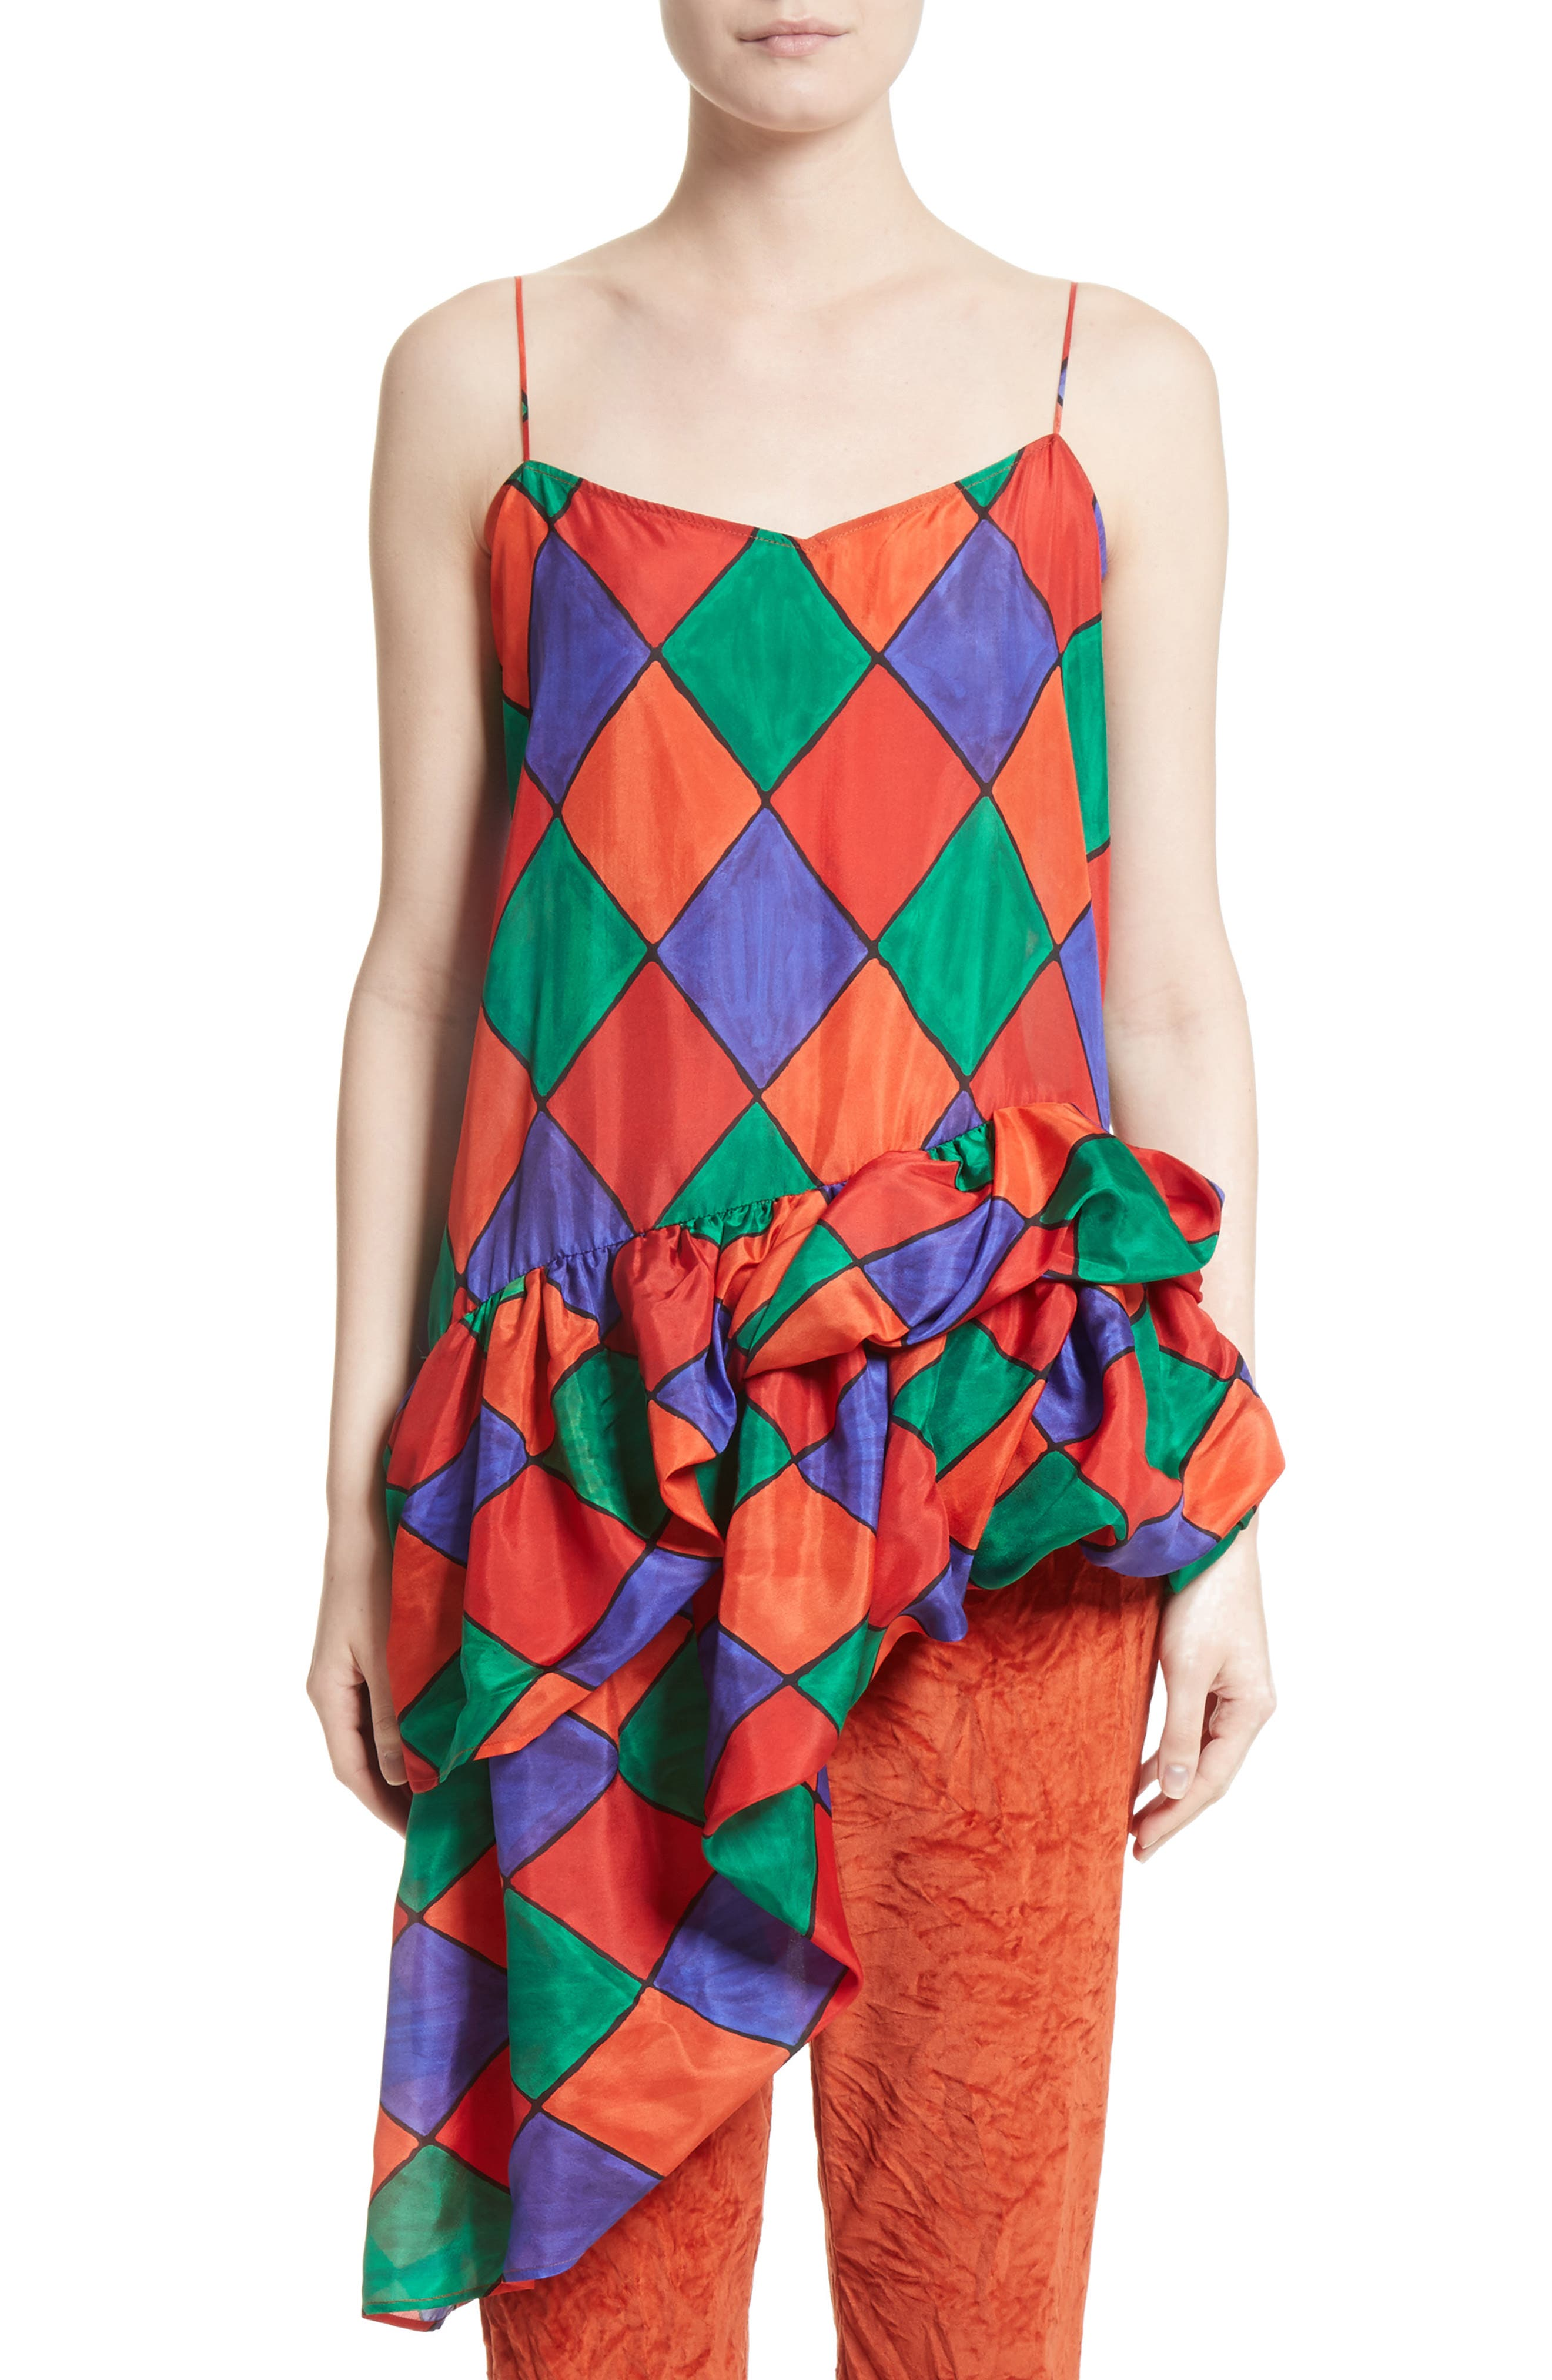 Fairy Asymmetrical Ruffle Silk Top,                             Main thumbnail 1, color,                             800